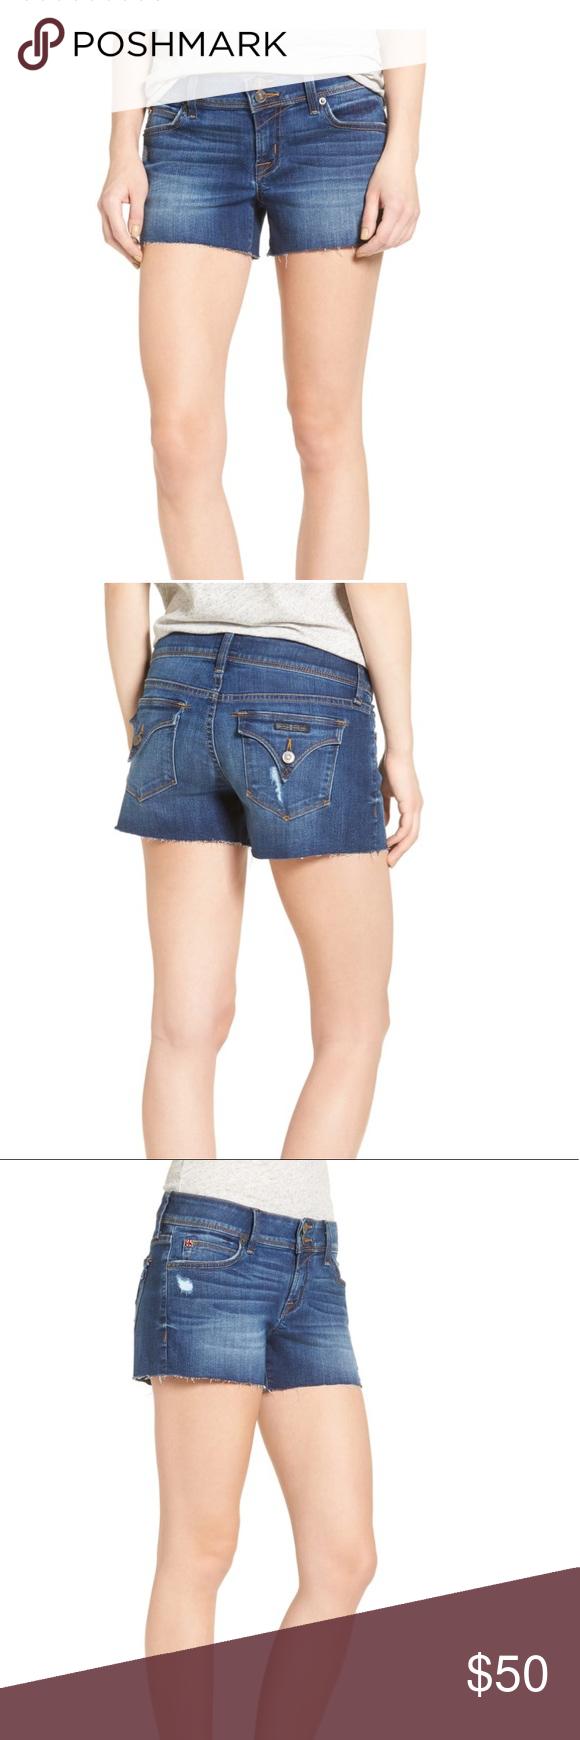 74fd42884 Hudson Croxley Cutoff Denim Shorts Hudson Croxley Cutoff Denim Shorts.  Color is insight. Mid rise. Like new, worn once. Hudson Jeans Shorts Jean  Shorts